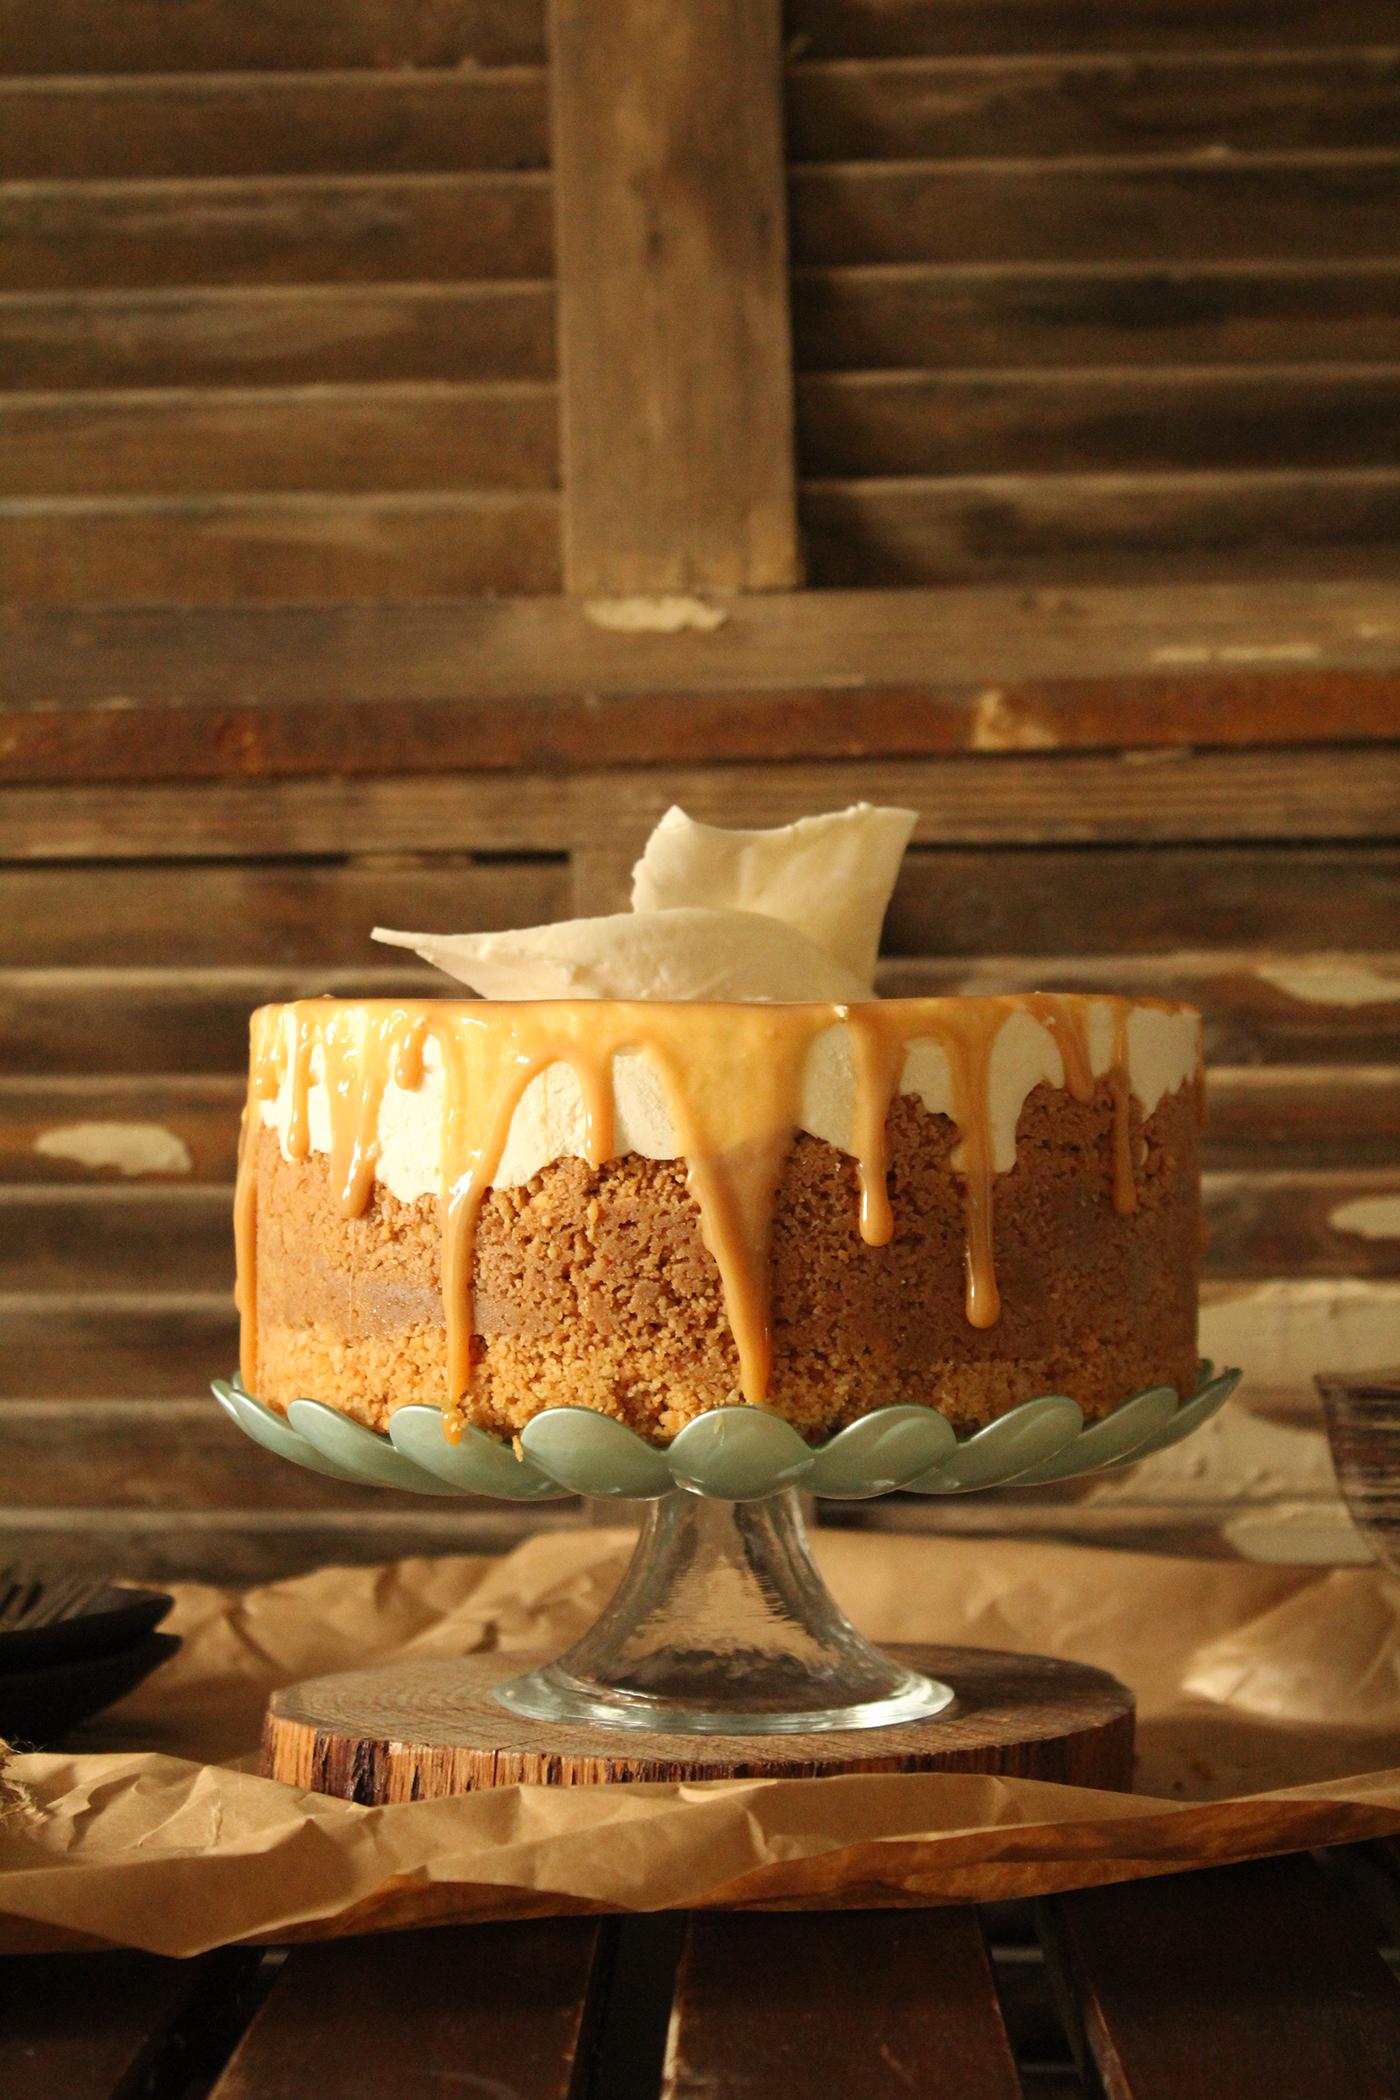 IMG 8346 - עוגת גבינה בציפוי ריבת חלב